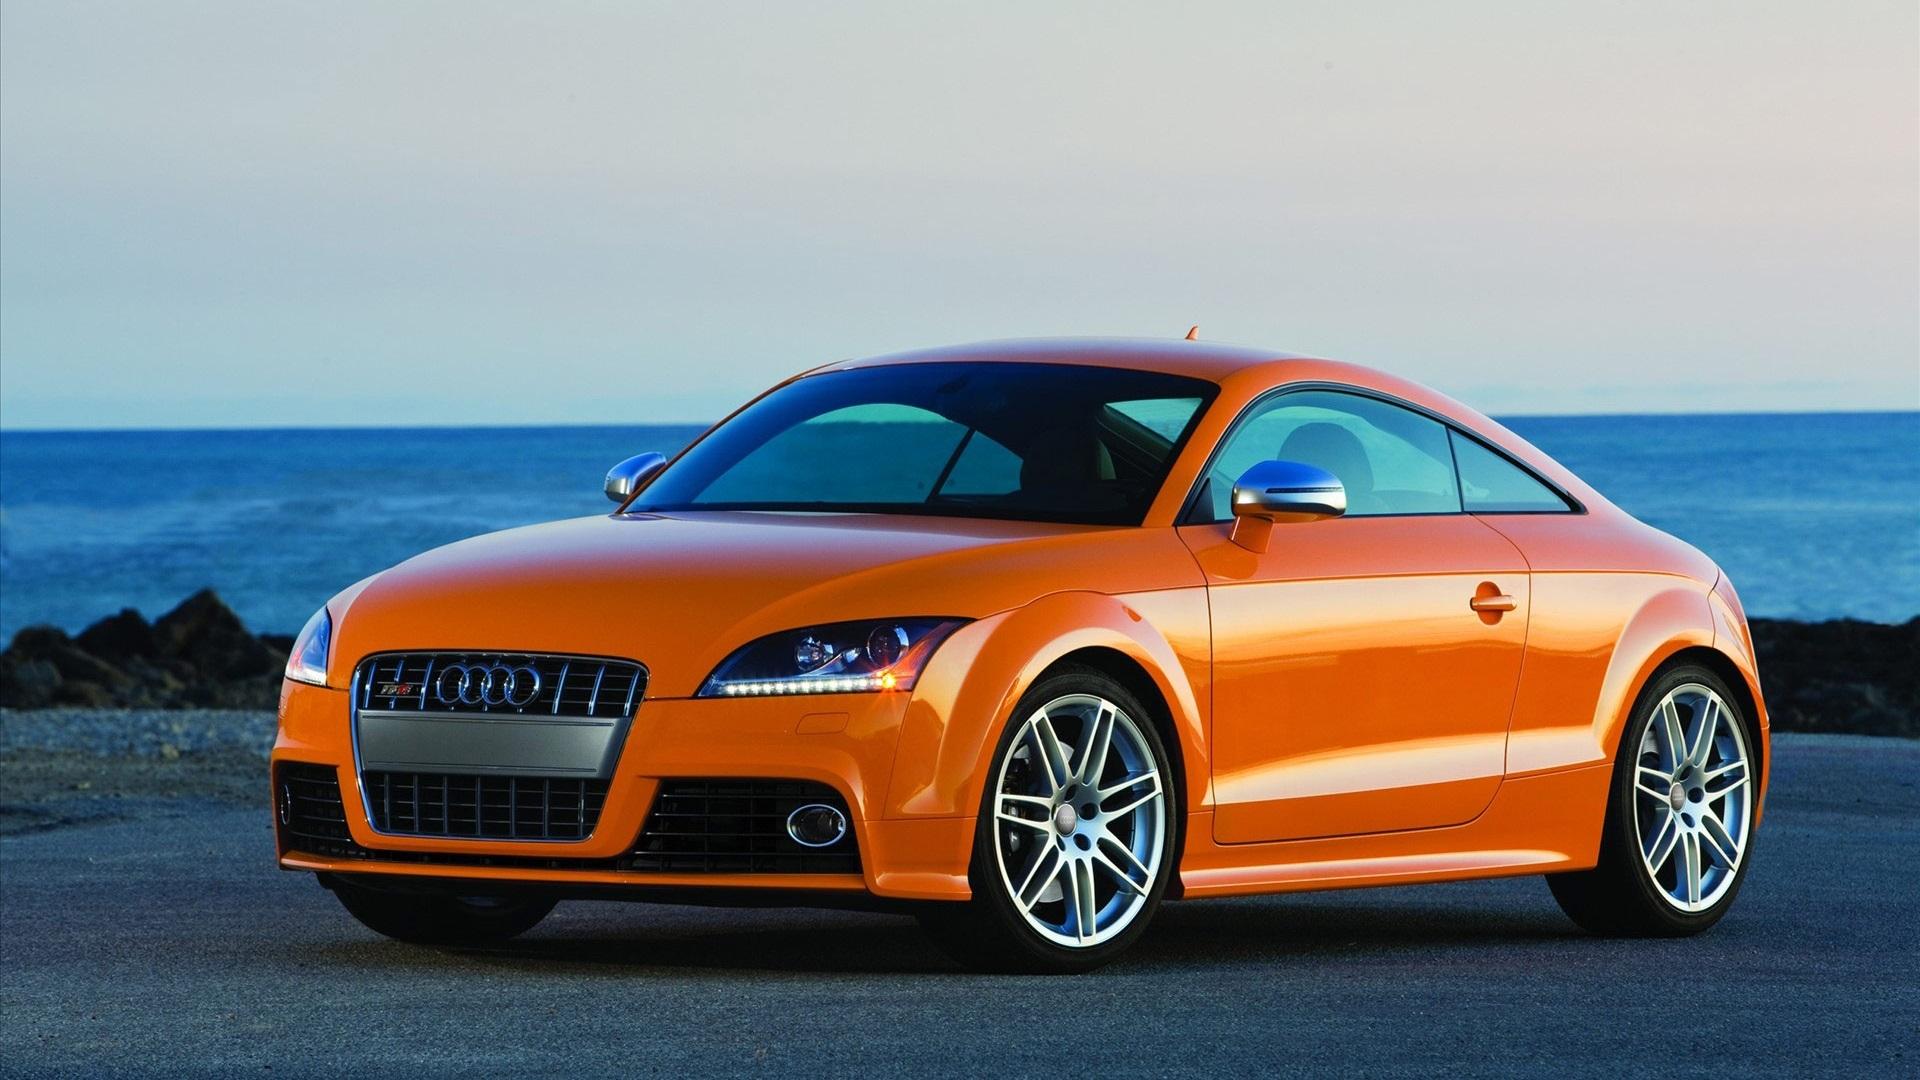 Wallpaper Audi Tt Coupe Orange Color 1920x1080 Full Hd 2k Picture Image